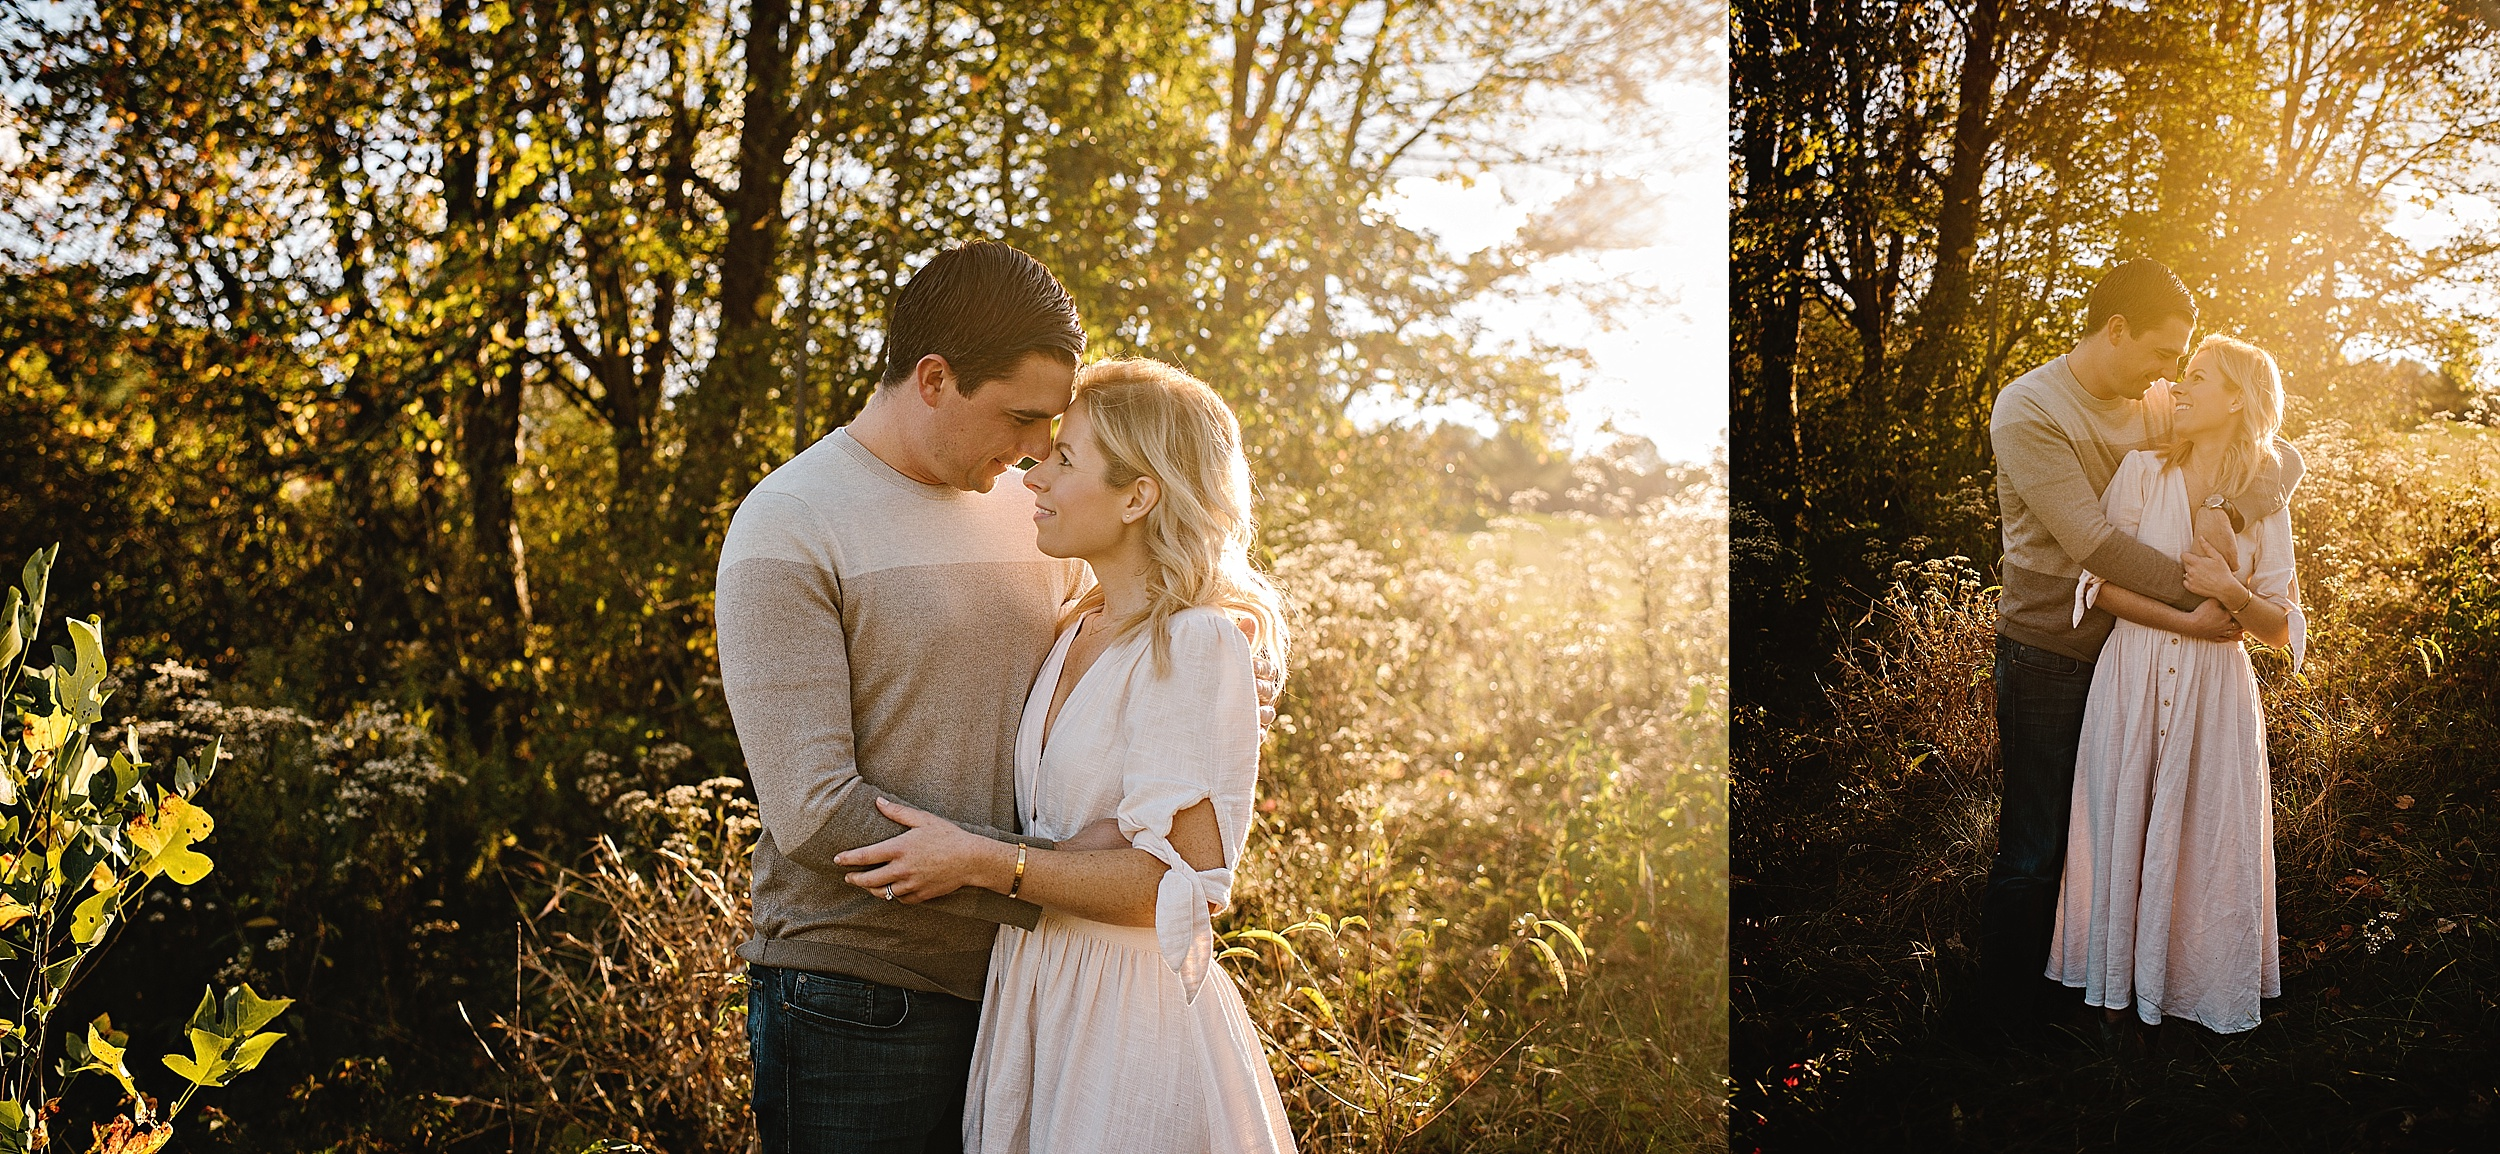 lauren-grayson-photography-portrait-artist-akron-cleveland-ohio-photographer-family-session-fields-sunset-fall_0180.jpg